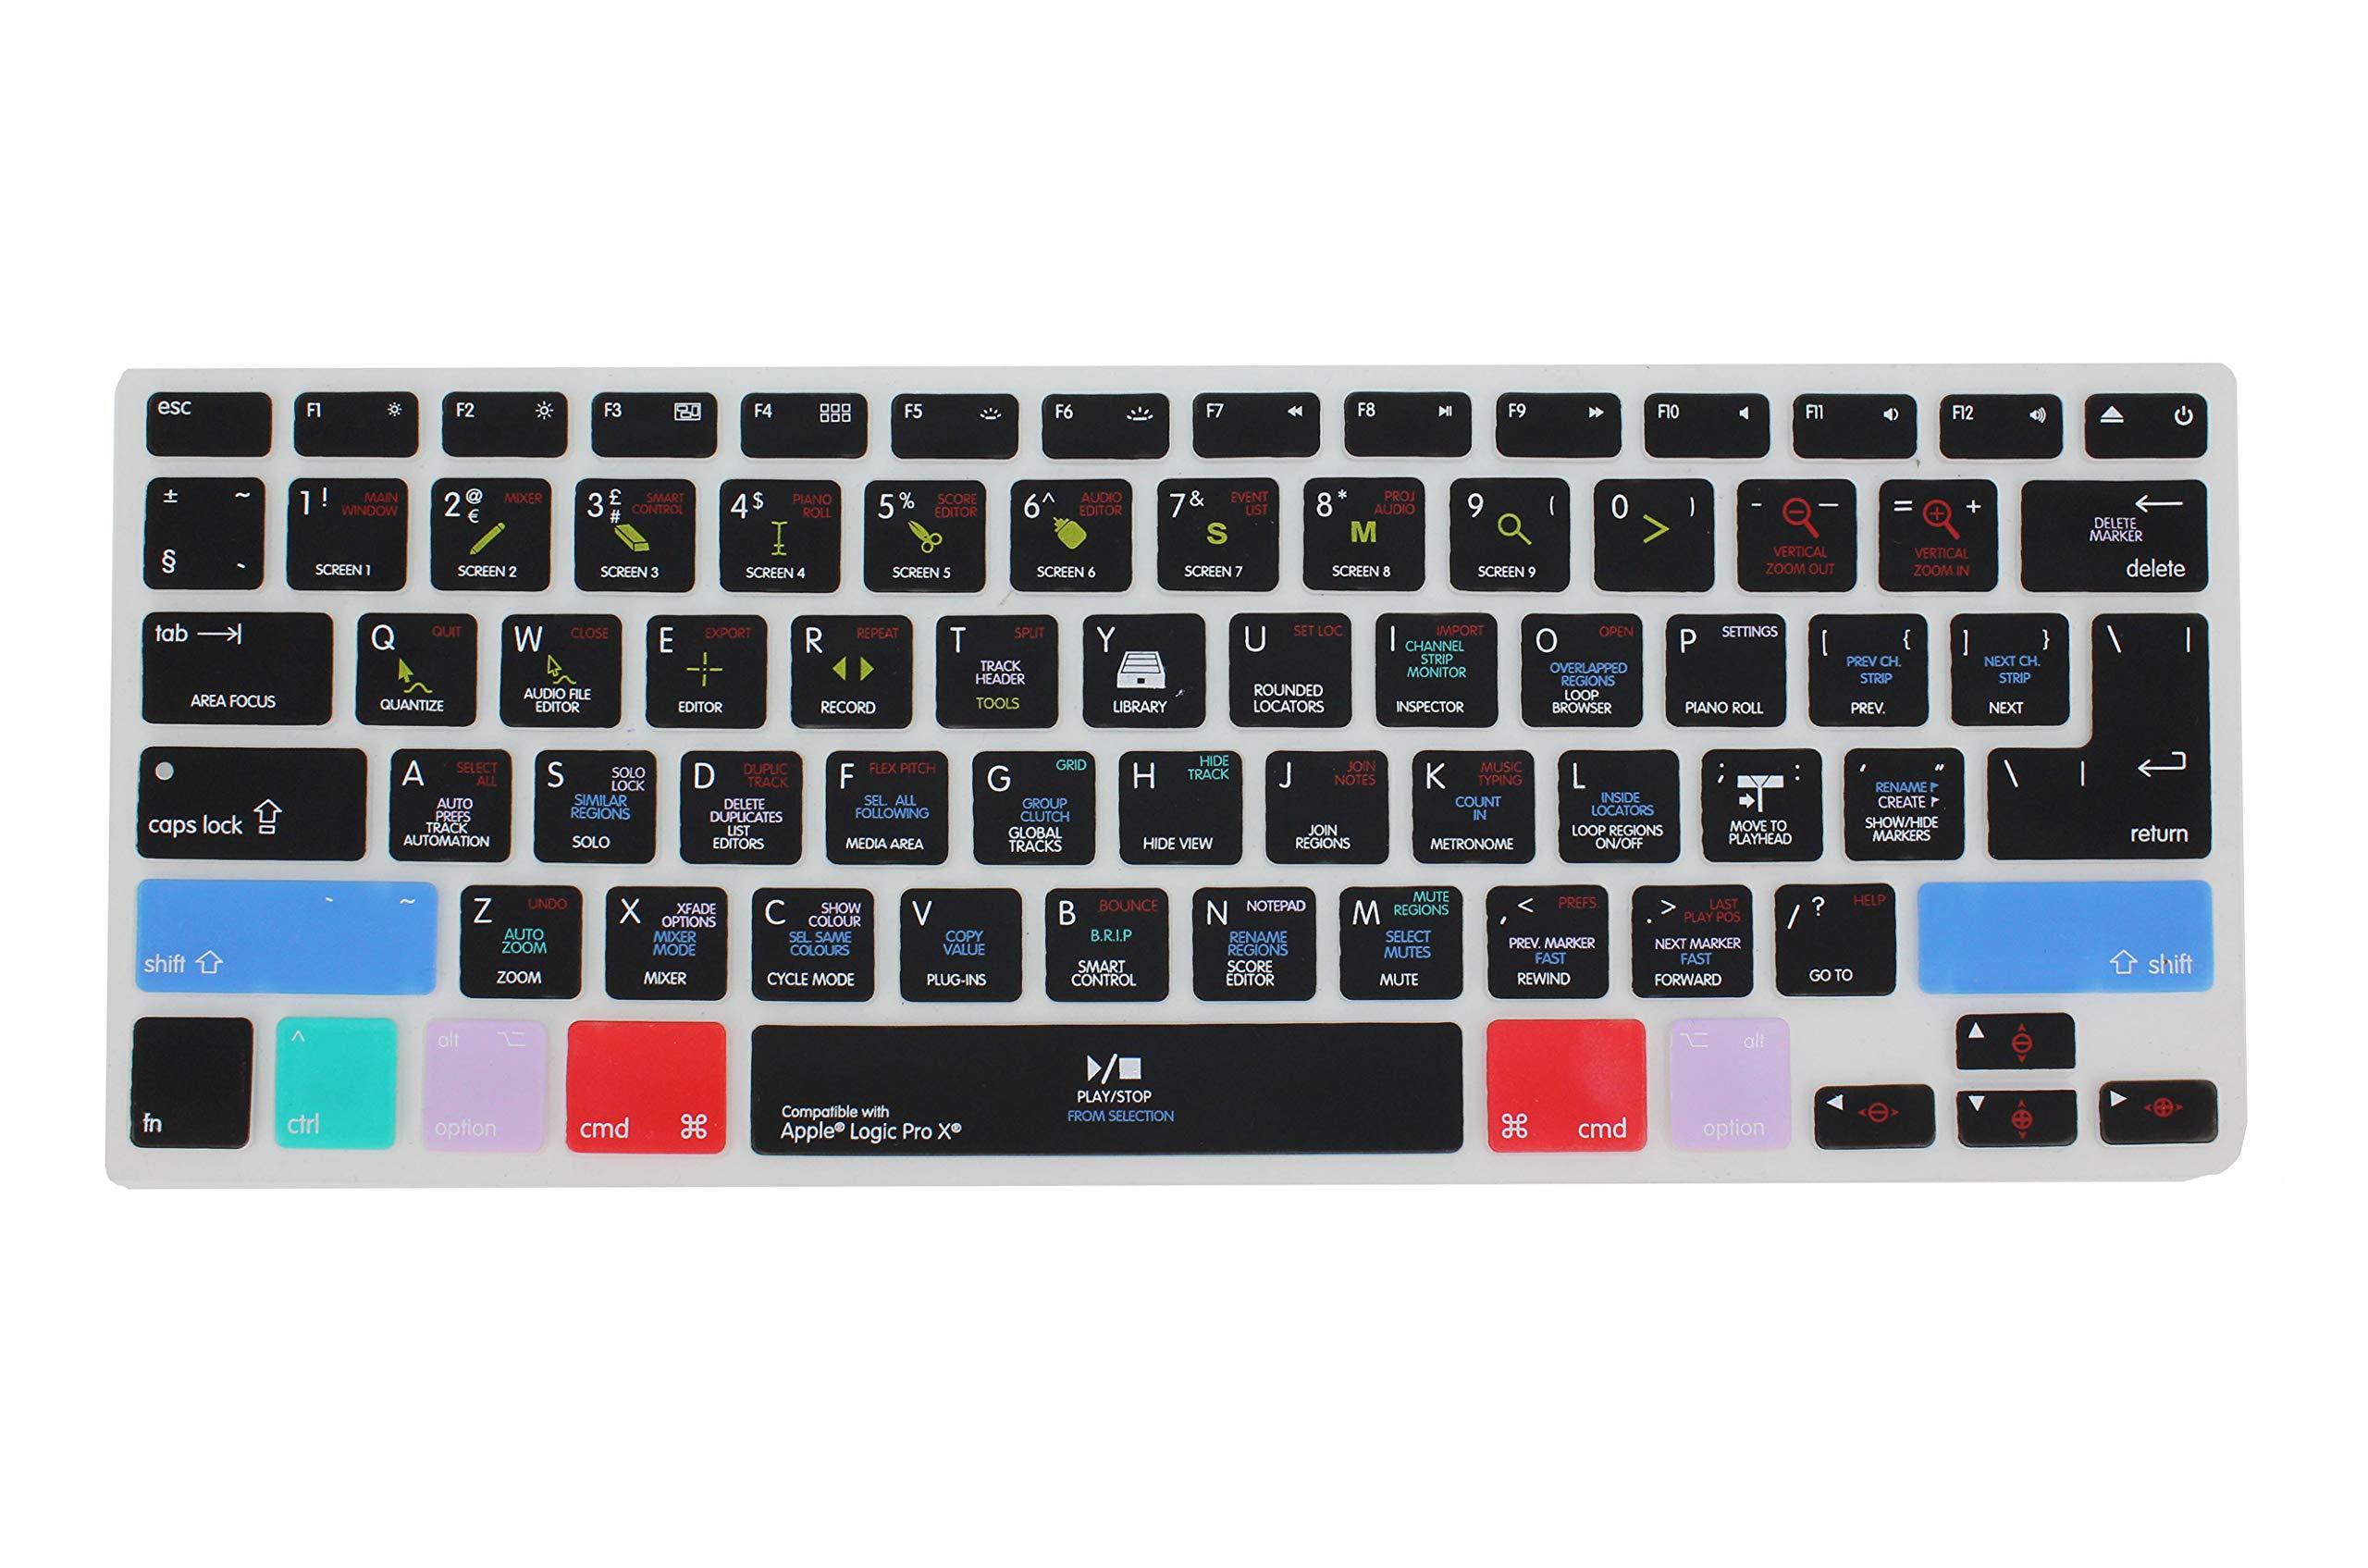 Saco Apple Logic Pro X 10 Shortcut Design Silicone Keyboard Skin Cover for MacBook 13 15 17 inch (US & EU Layout) - Black (B01MYRGXR5) Amazon Price History, Amazon Price Tracker